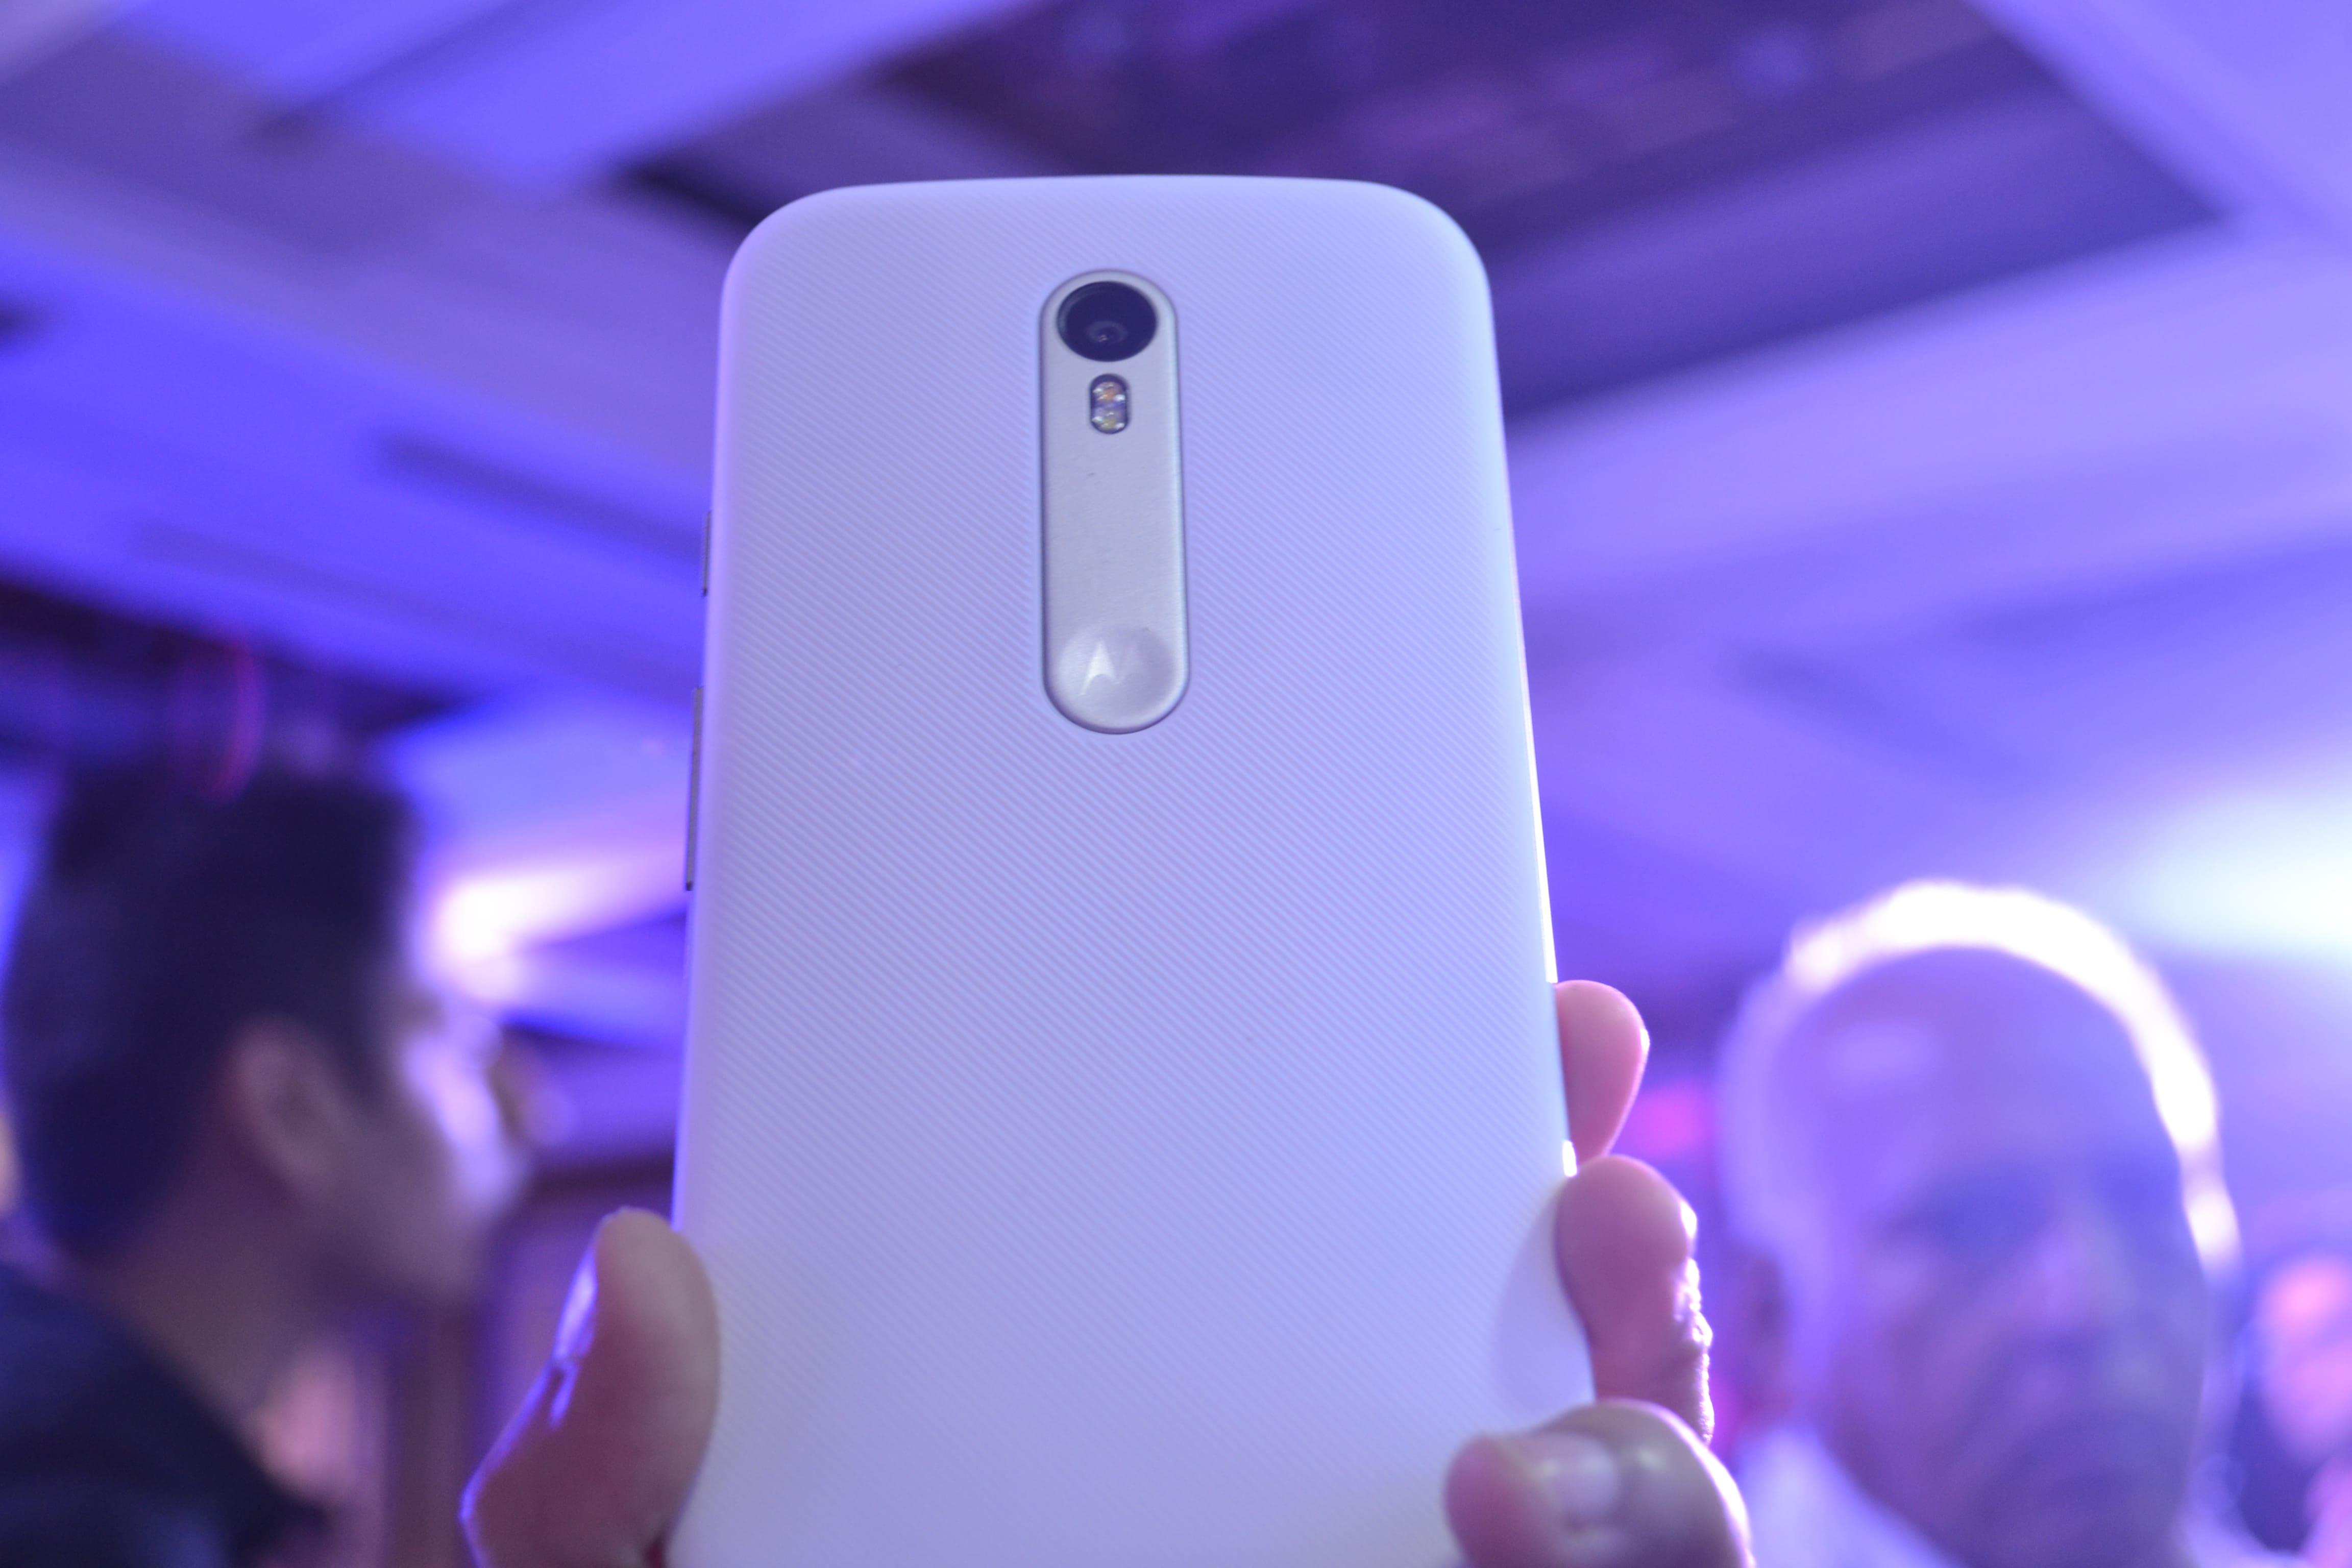 Motorola, Moto G, Motorola Moto G third gen, Moto g3, Motorola Moto G3, Motorola Moto G3 specs, Motorola Moto G3 price, Motorola Moto G3 Flipkart, smartphones, technology news